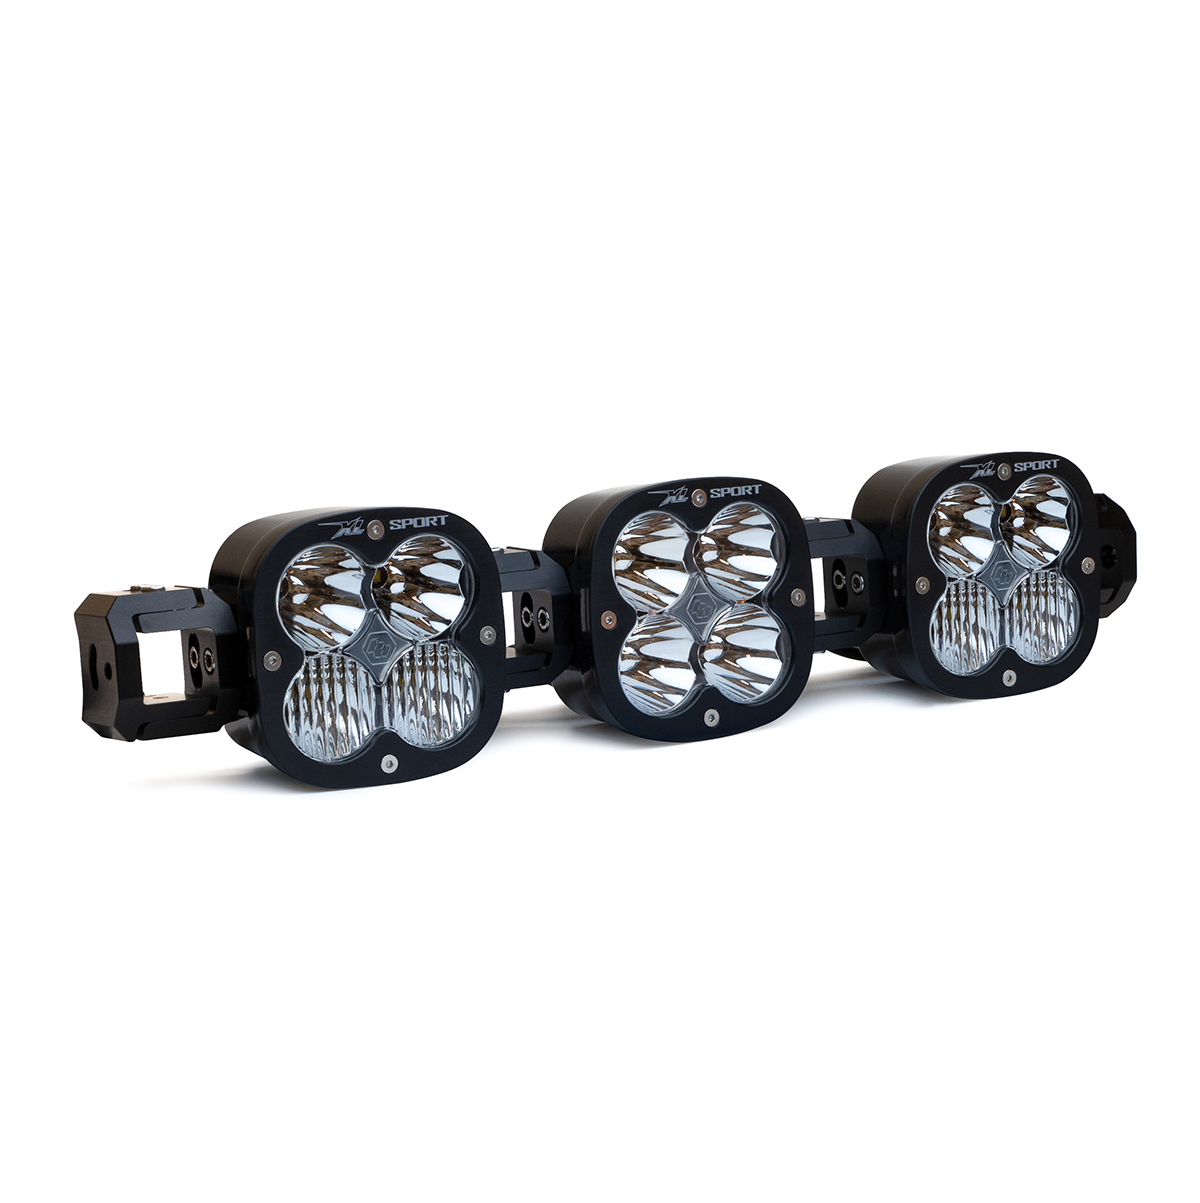 Baja Designs XL LINKABLE, 3 XL CLEAR LED LIGHT BAR